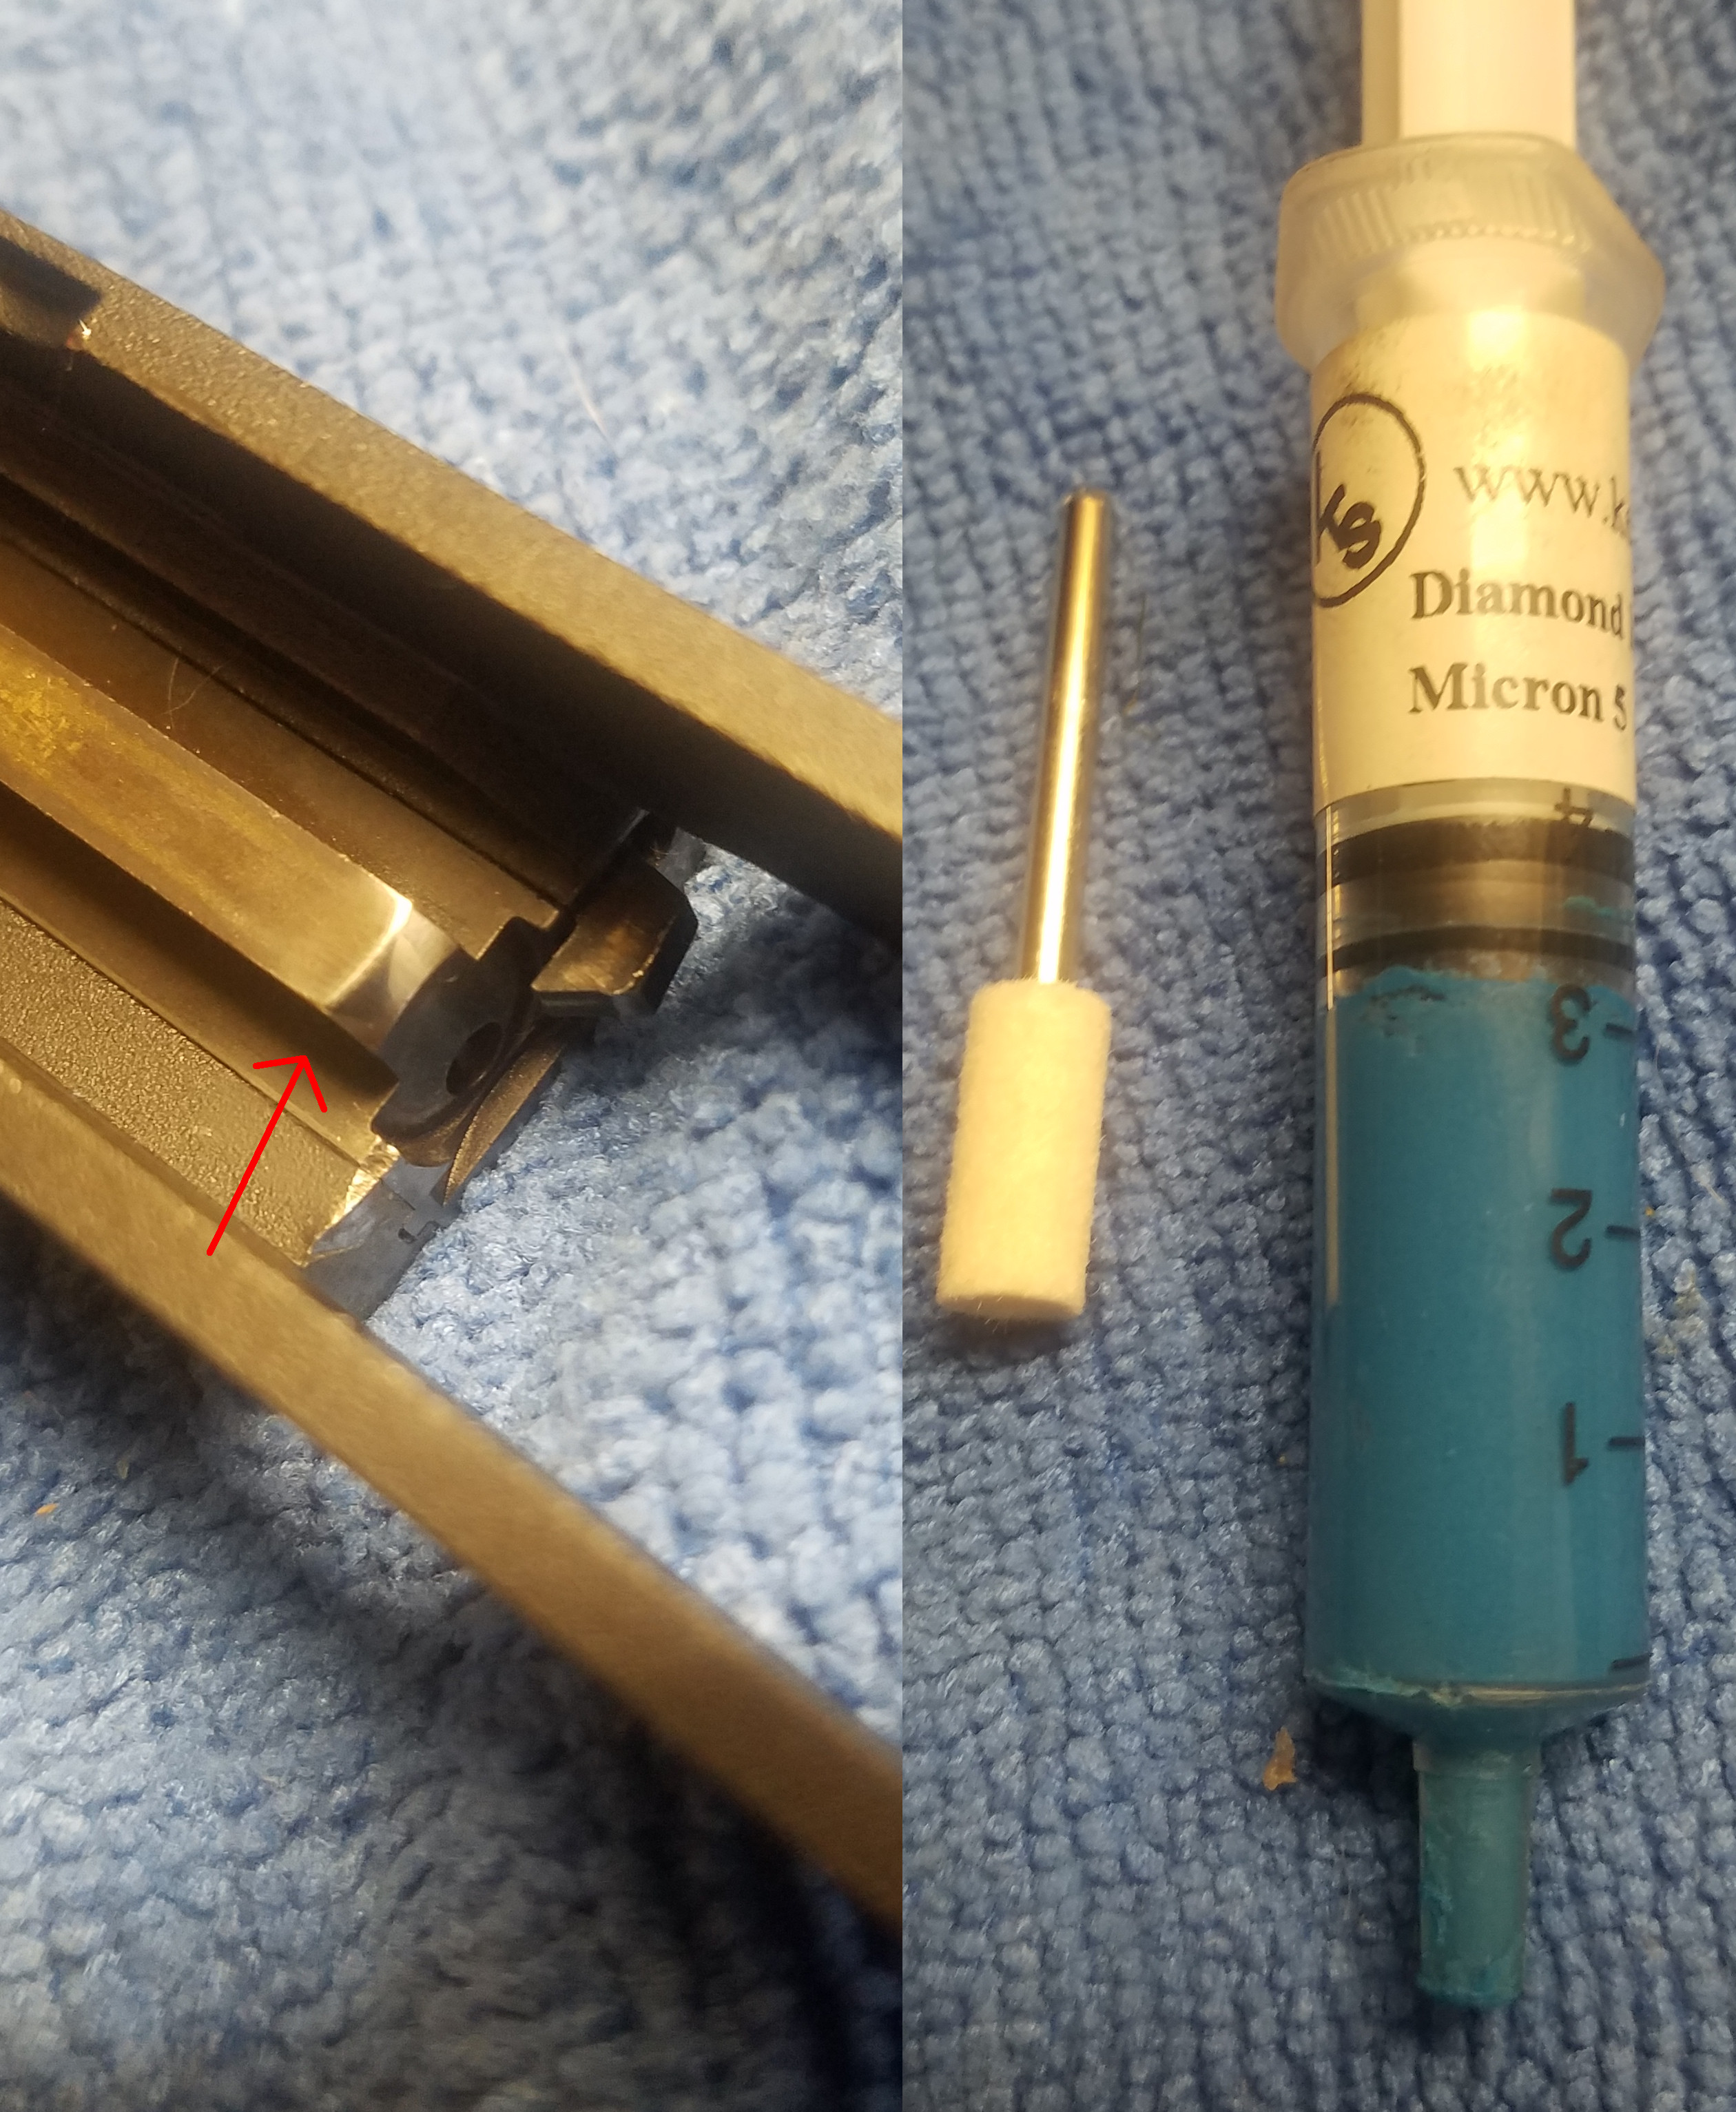 Smith & Wesson Model 41 - rounds damaged in magazine, prior to feeding Sw41polish2